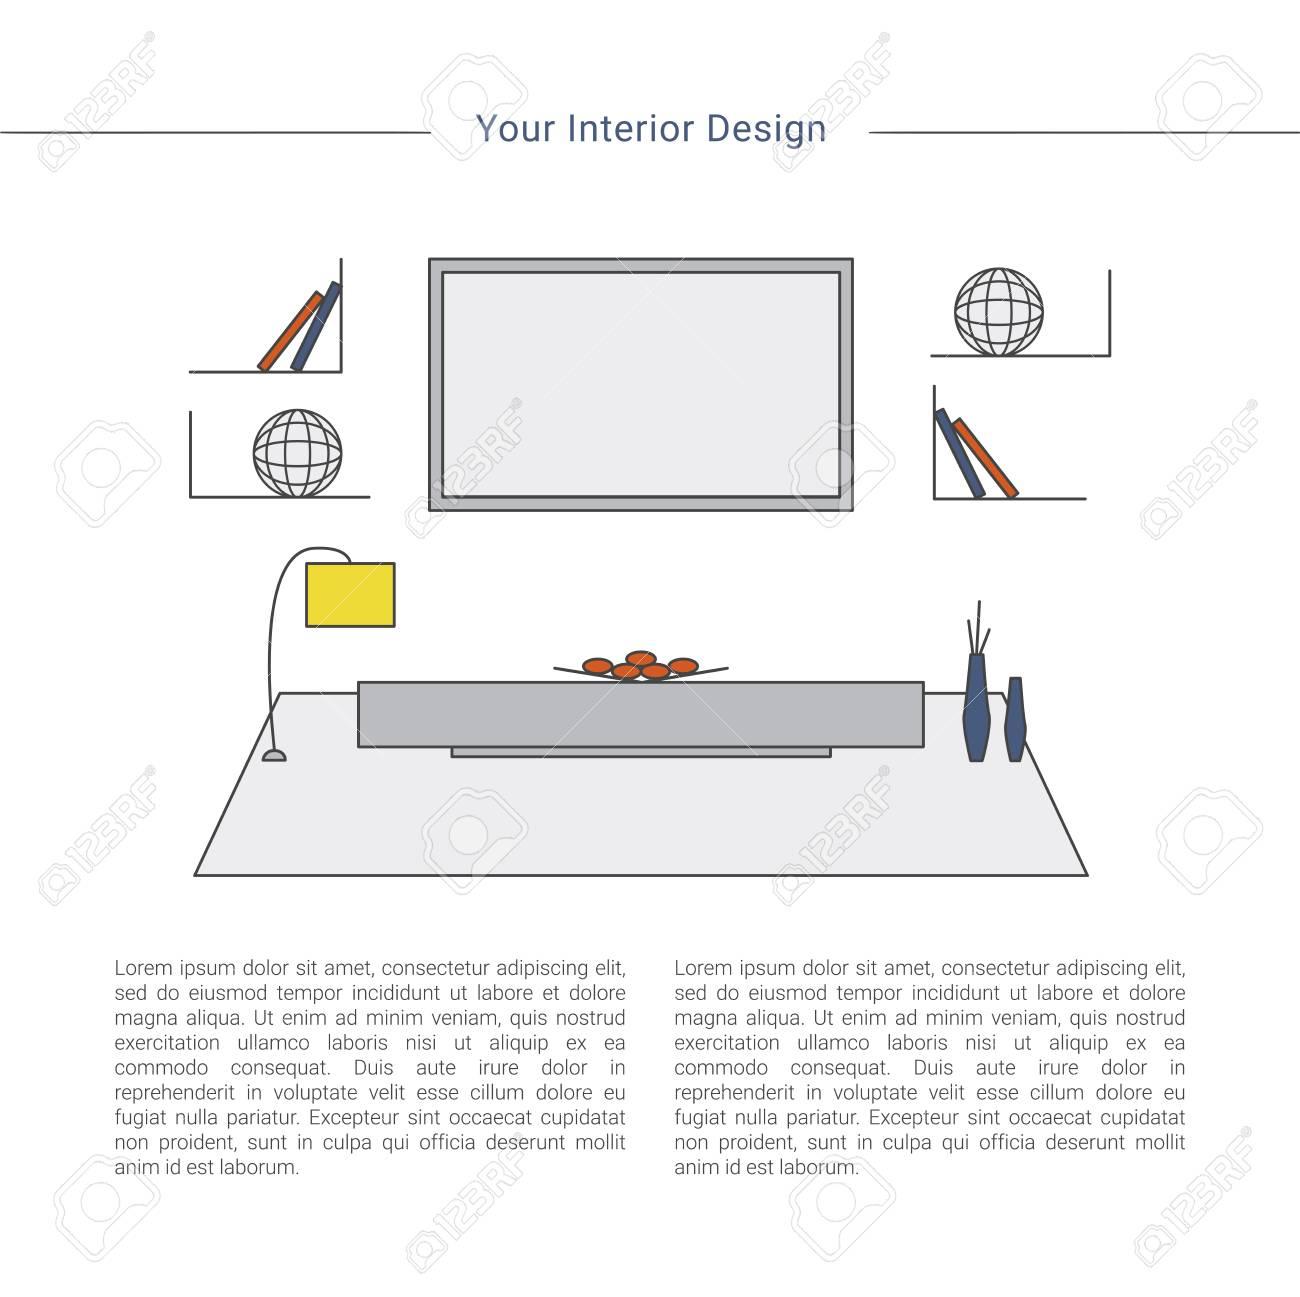 Living Room Interior Design Concept. Home Design Template. Colorful ...